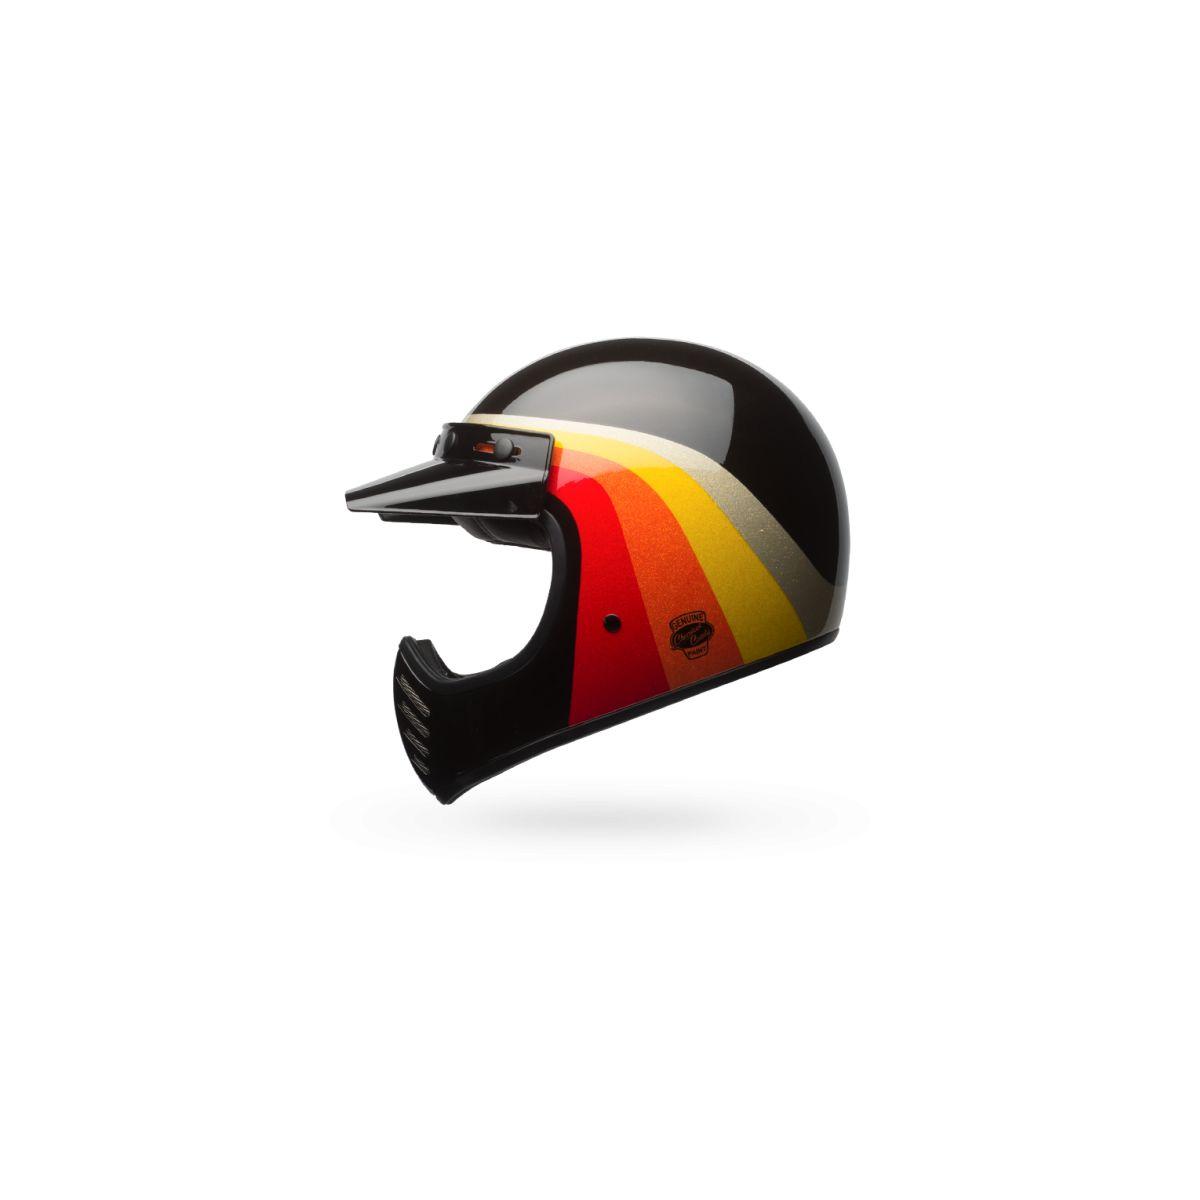 Bell Moto 3 Chemical Candy Helmet 1 - Bell Moto-3 Chemical Candy Helmet